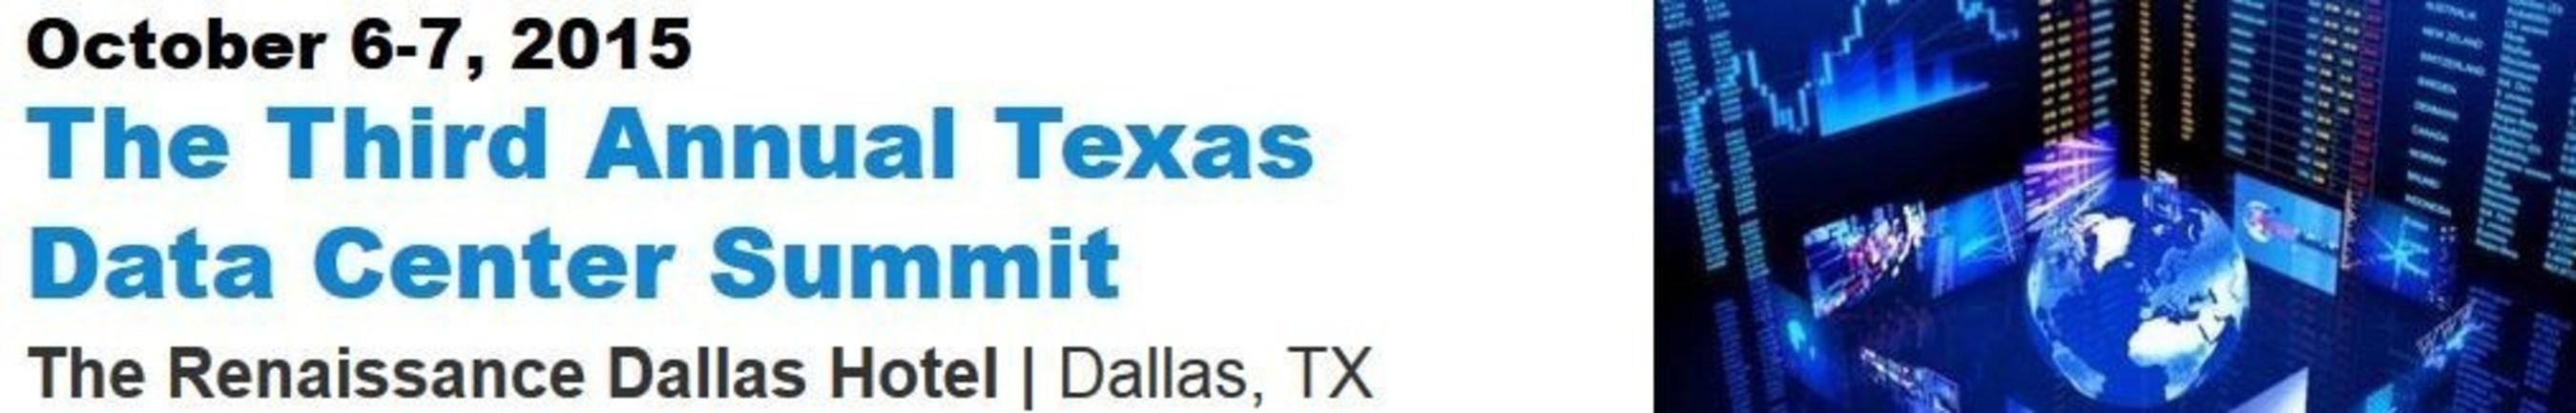 Texas Data Center Markets in Focus: Dallas, San Antonio, Houston, Austin